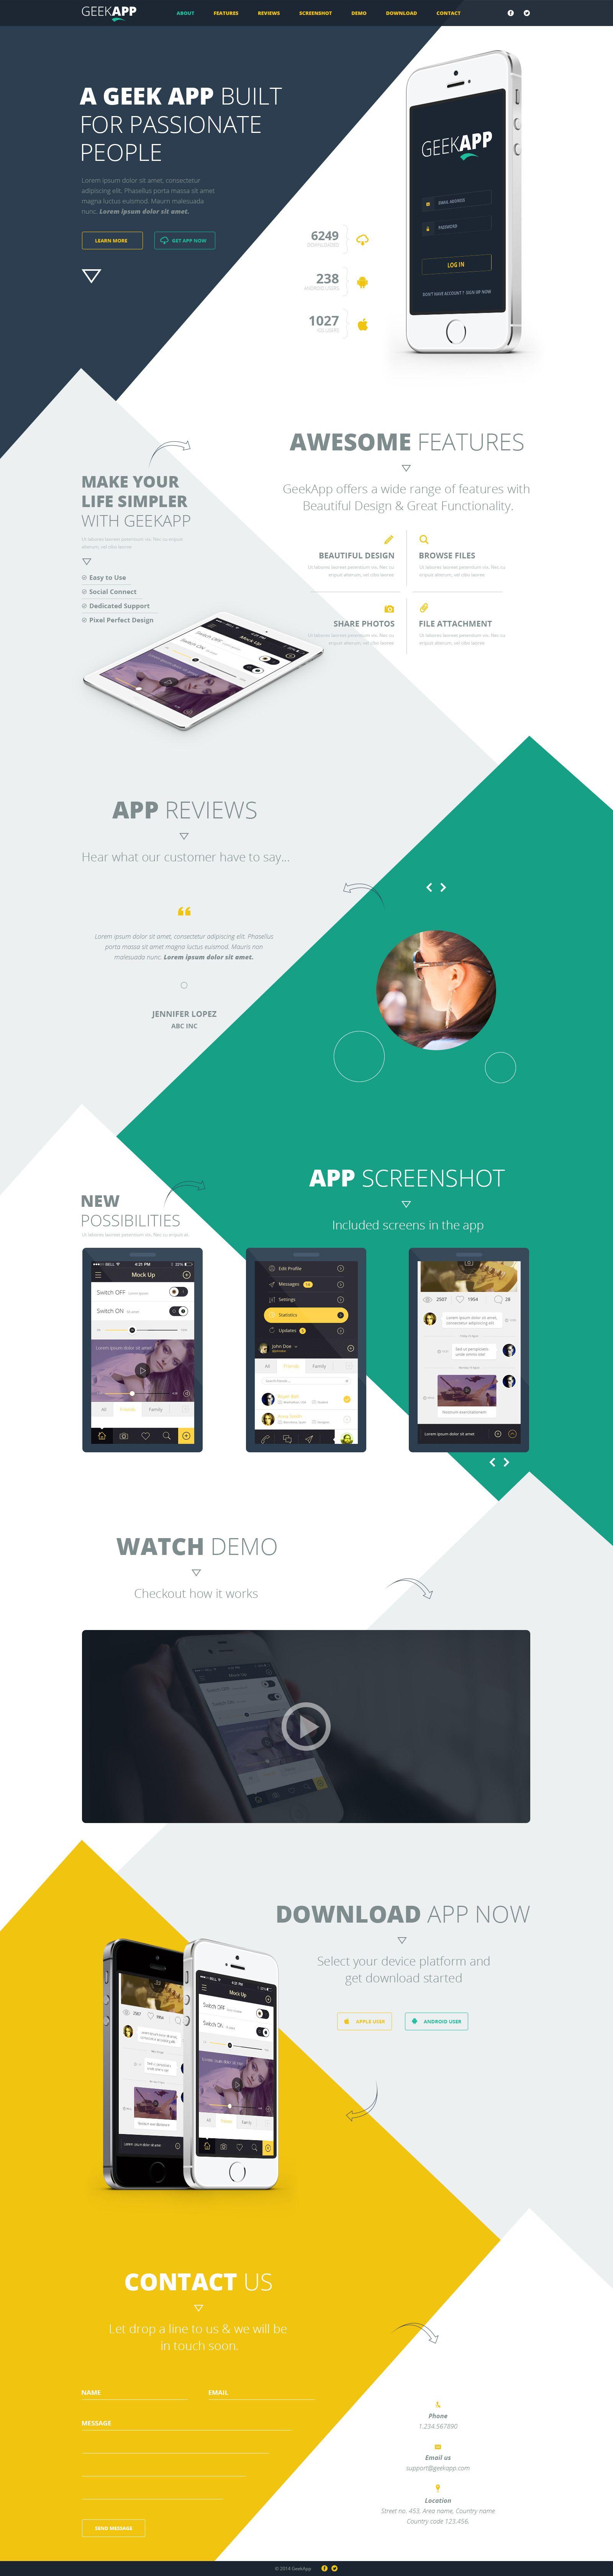 Geekapp One Page App Landing Psd Template Web Design Ux Web Design Web App Design